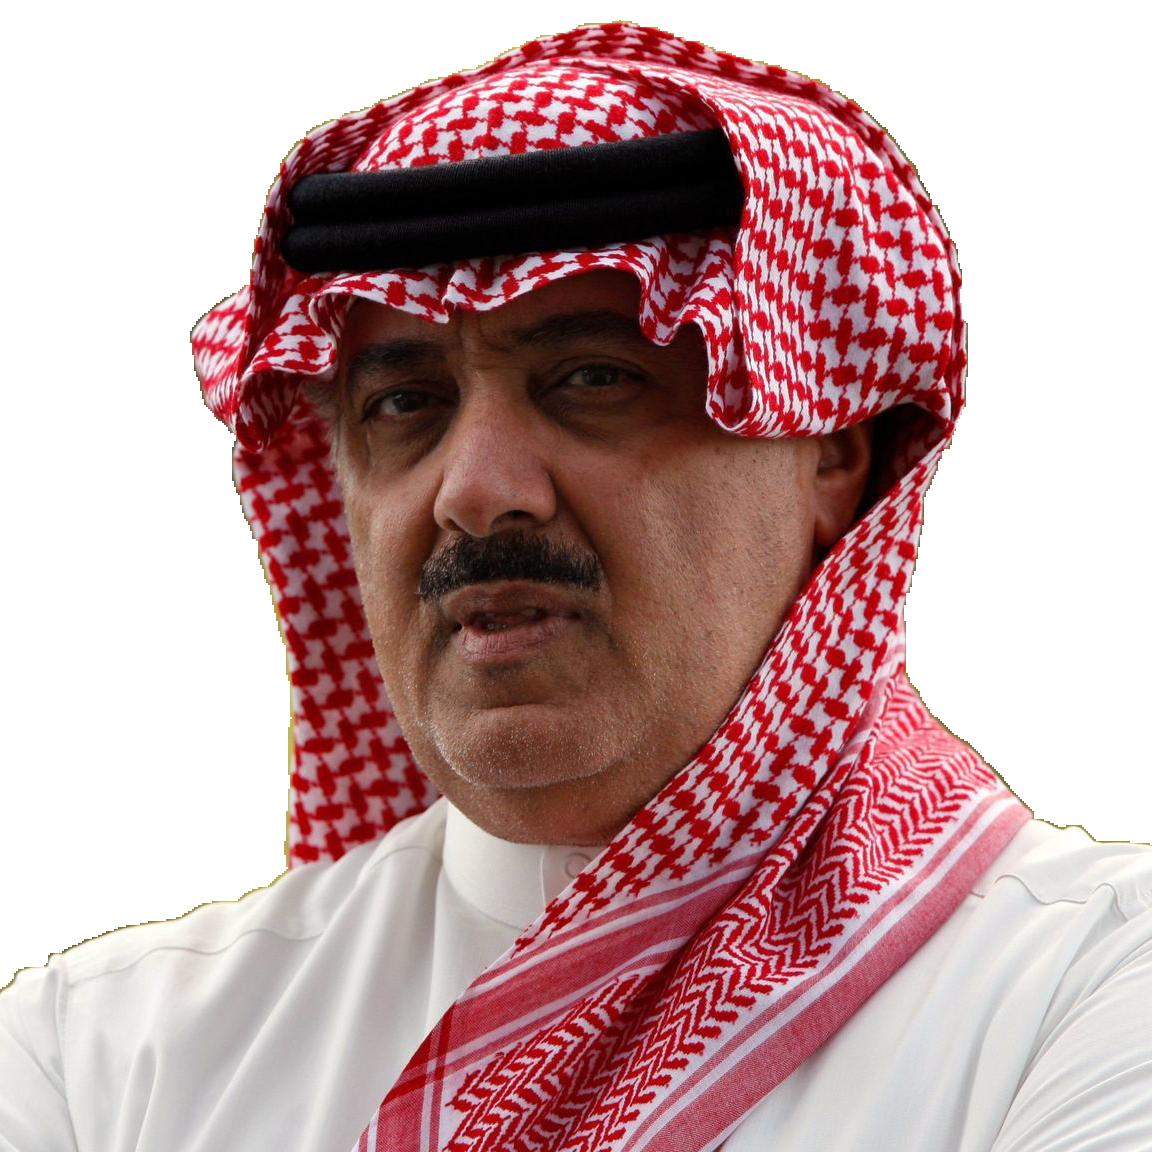 mutaib-bin-abdullah